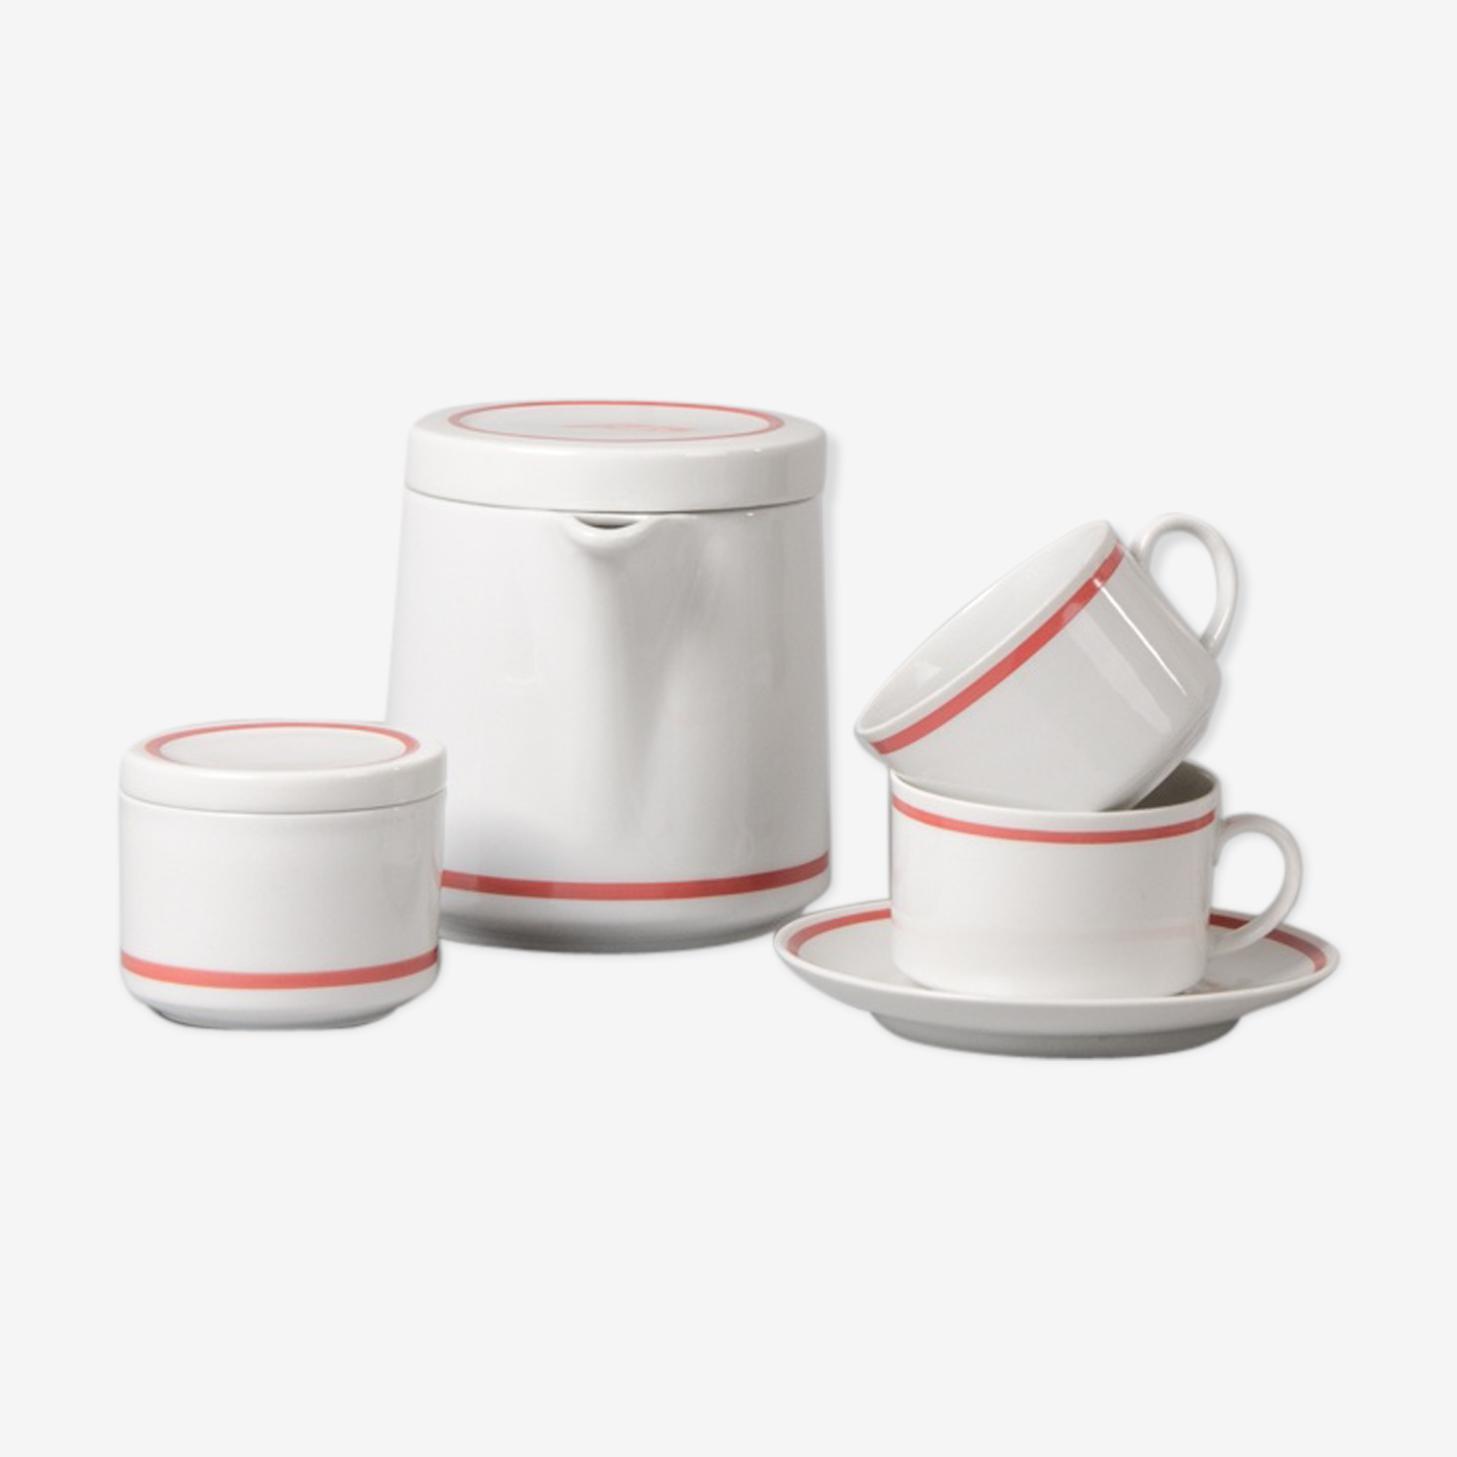 German coffee or tea set from seltmann weider, 1970s, set of 8